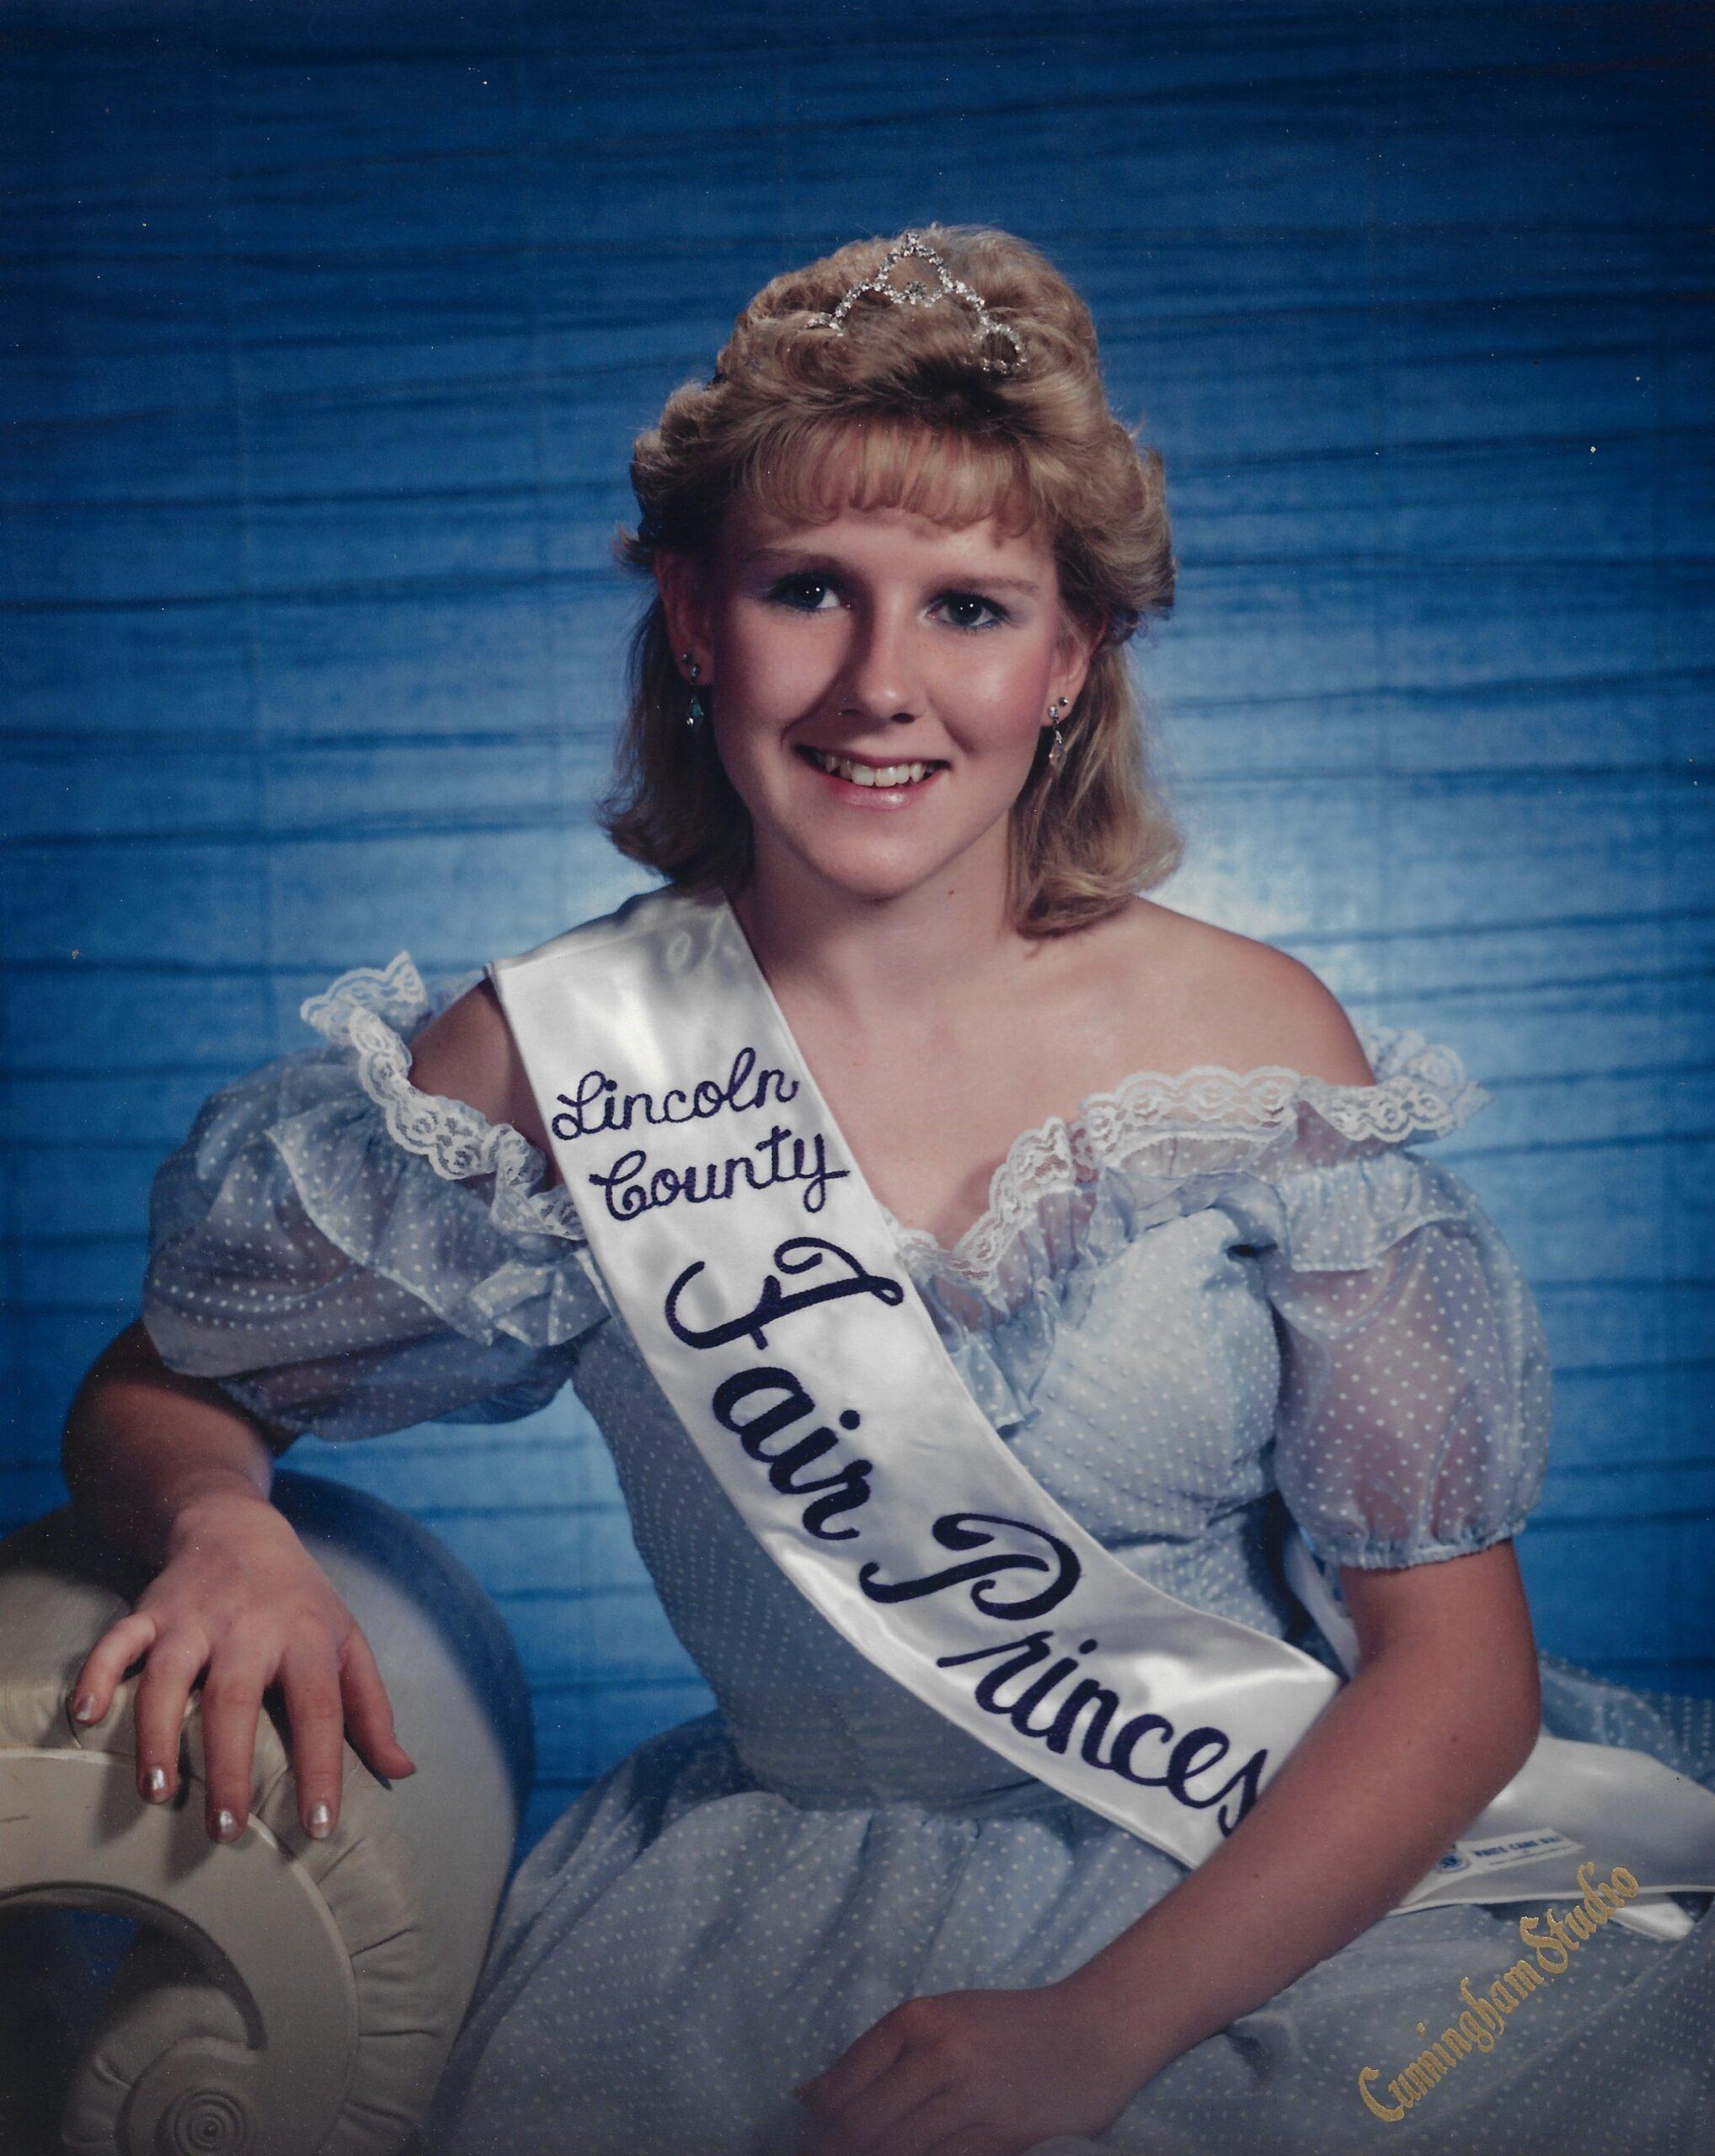 1978 Lincoln County Fair Queen